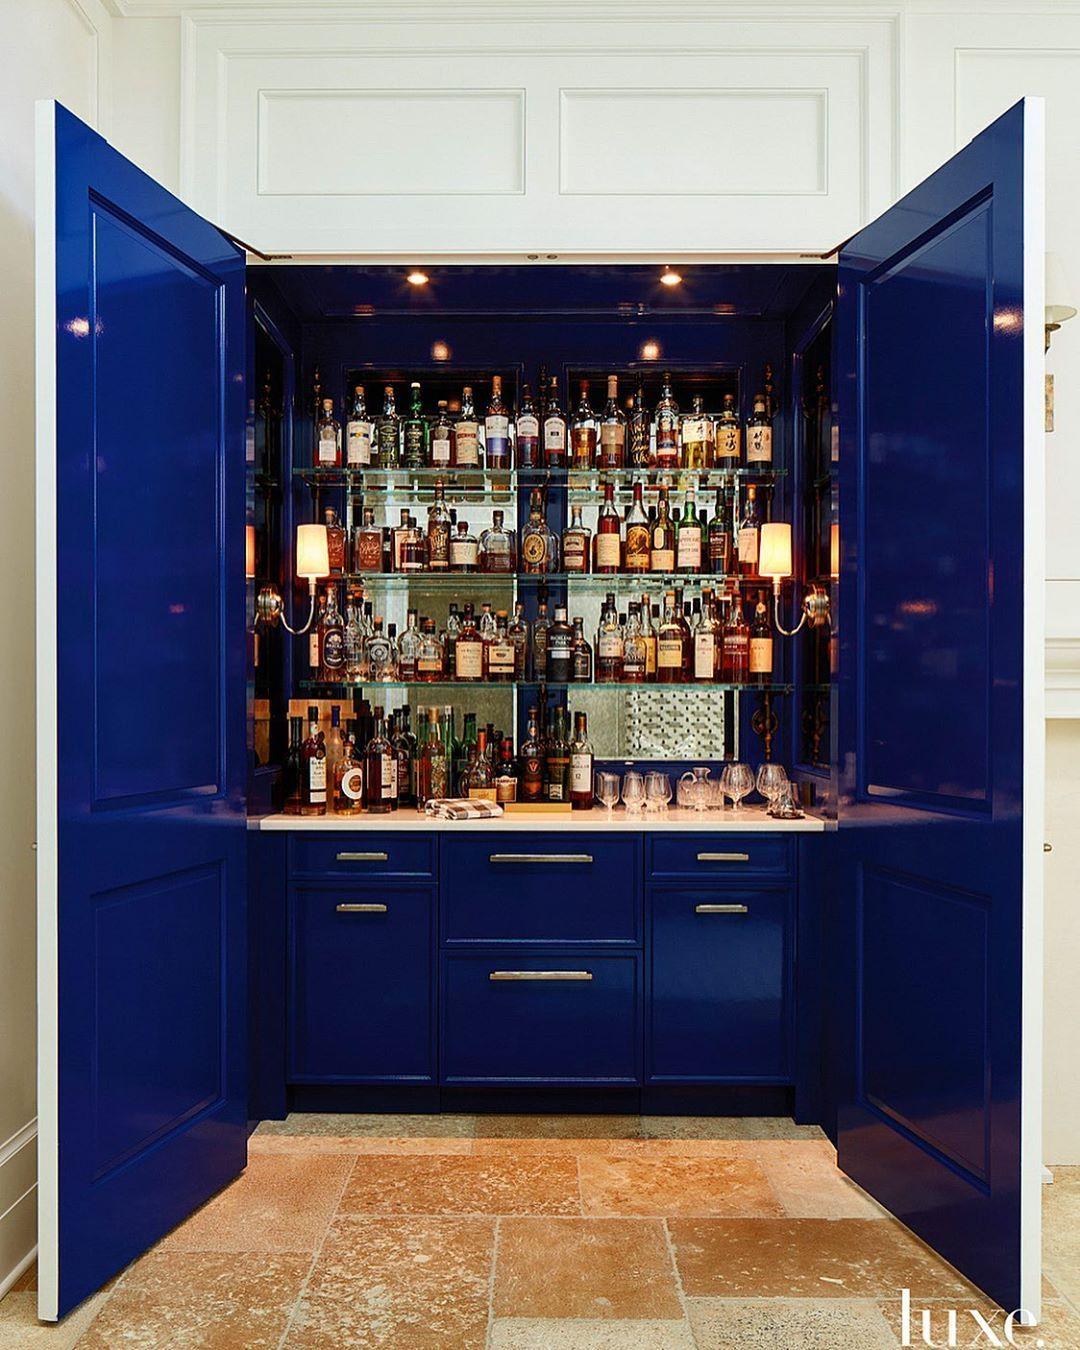 Luxe Interiors Design On Instagram In Home Speakeasy Luxeathome Sandow Photo Nathankirkmanphoto Arch Home Bar Designs Luxe Interiors Bars For Home